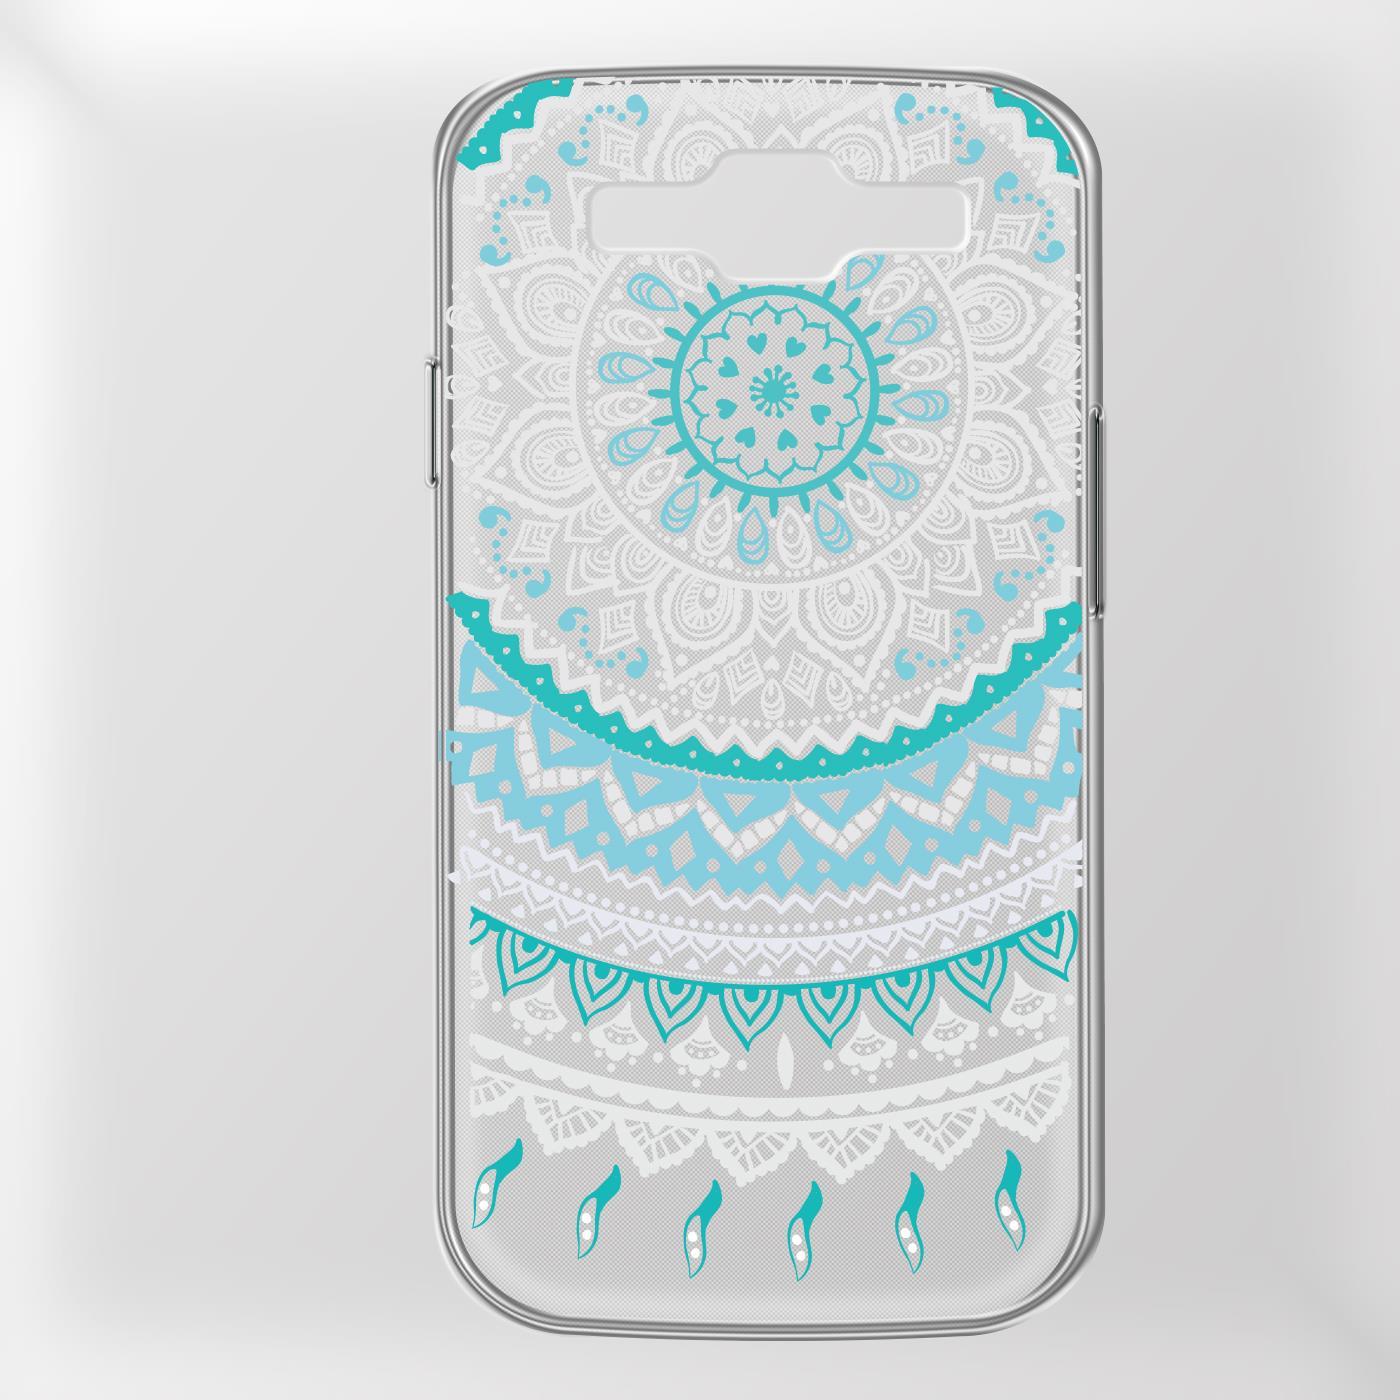 Samsung-Galaxy-S3-Neo-Handy-Schutz-Huelle-Case-TPU-Silikon-Cover-Tasche-Mandala Indexbild 10